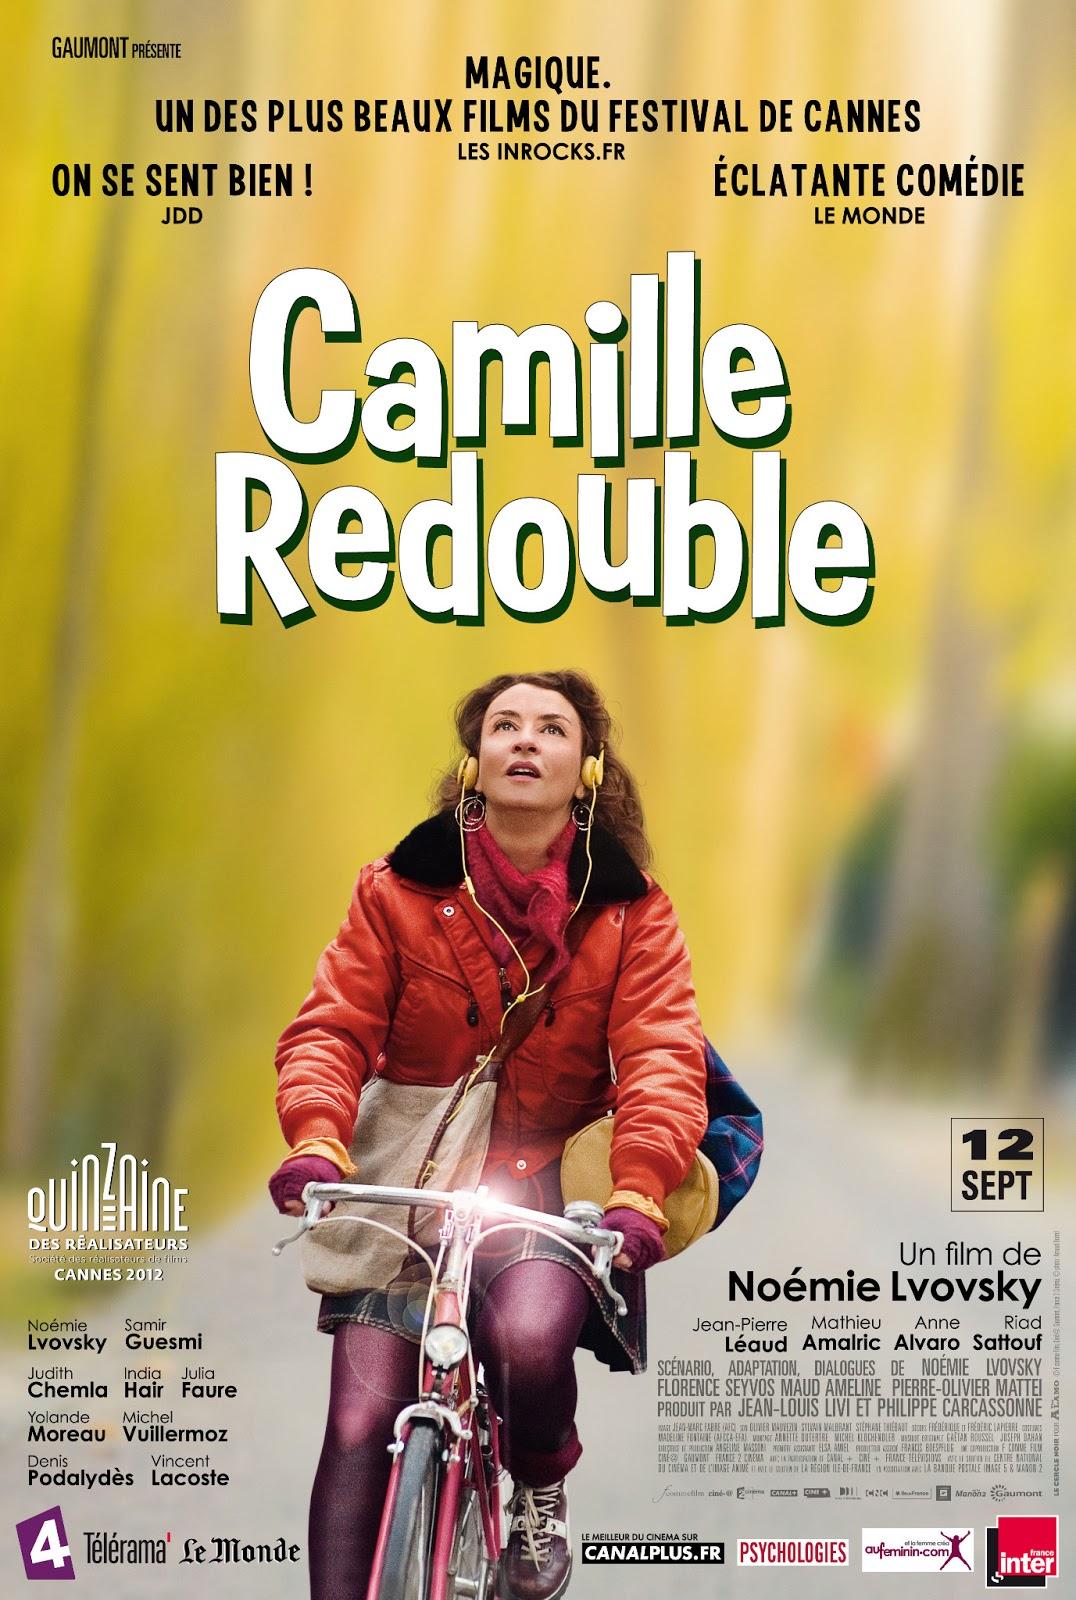 http://3.bp.blogspot.com/-1S-JI4aQyvc/UQaZa0xHuLI/AAAAAAAADGw/2lFS5_U_-qw/s1600/Camille-redouble-3.jpg